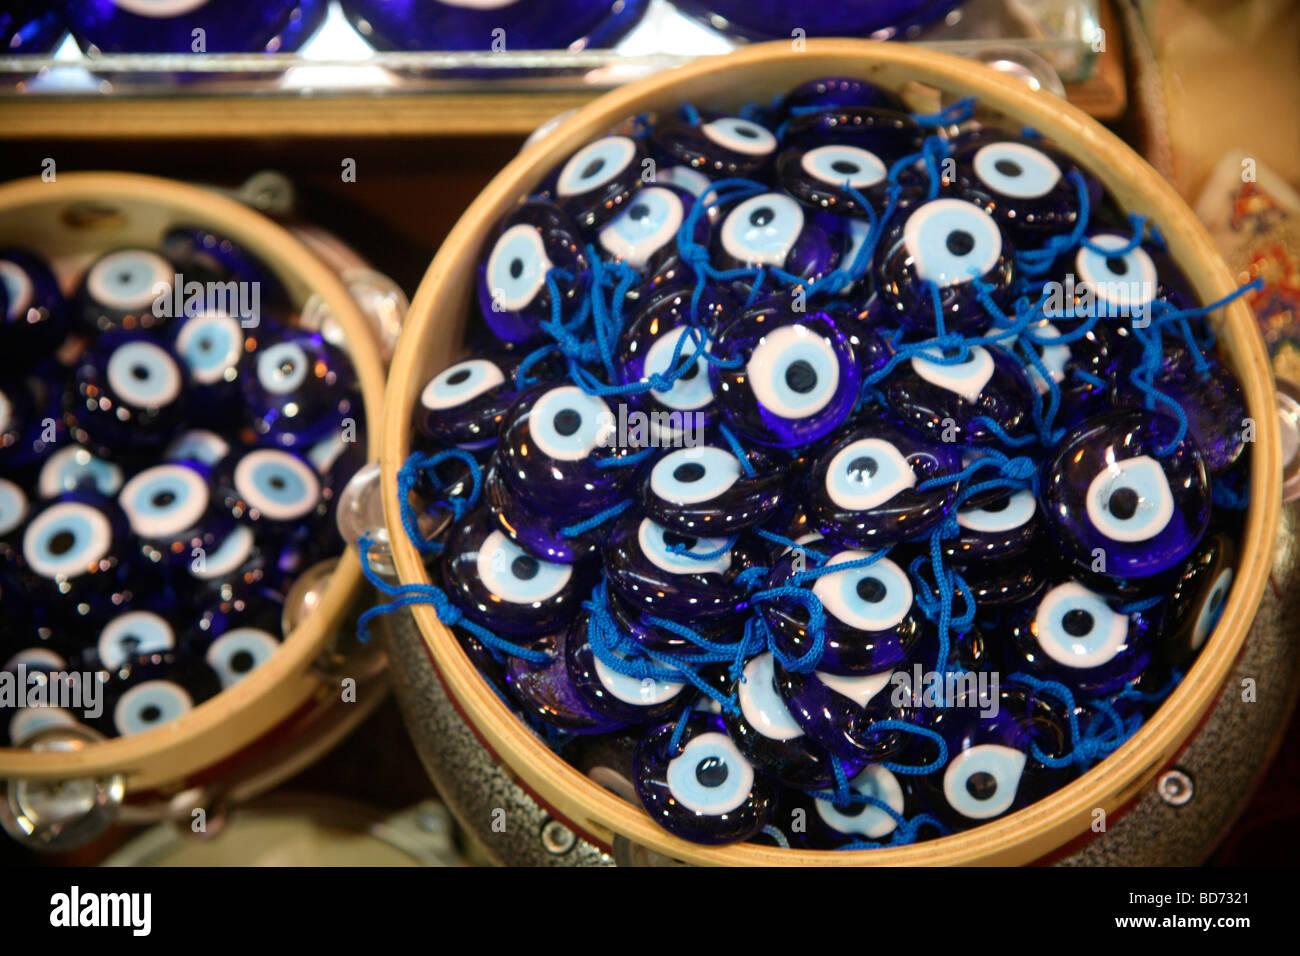 Basket of blue eyes istanbul bazaar the eye symbol is a basket of blue eyes istanbul bazaar the eye symbol is a talsiman in many eastern countries biocorpaavc